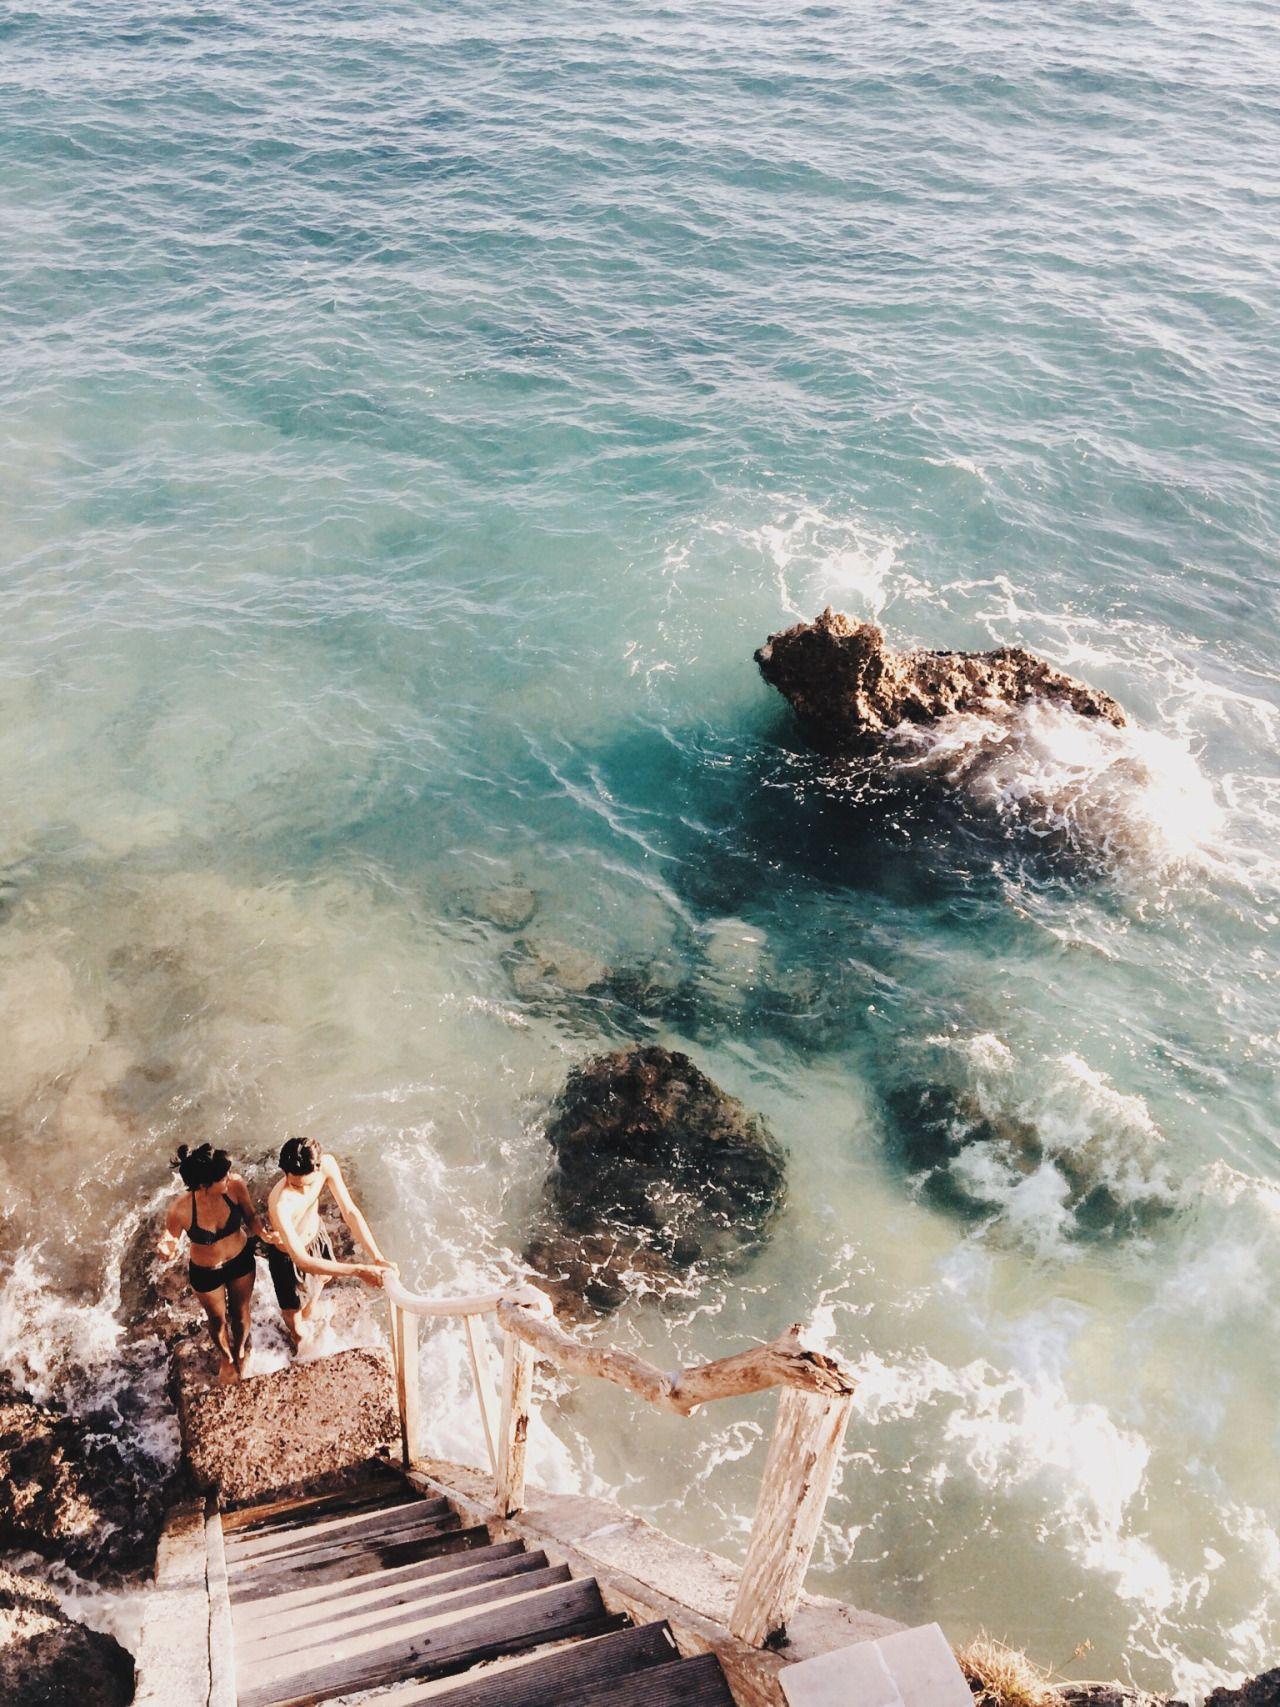 liz-rulao   Adventure travel, Travel, Surfing